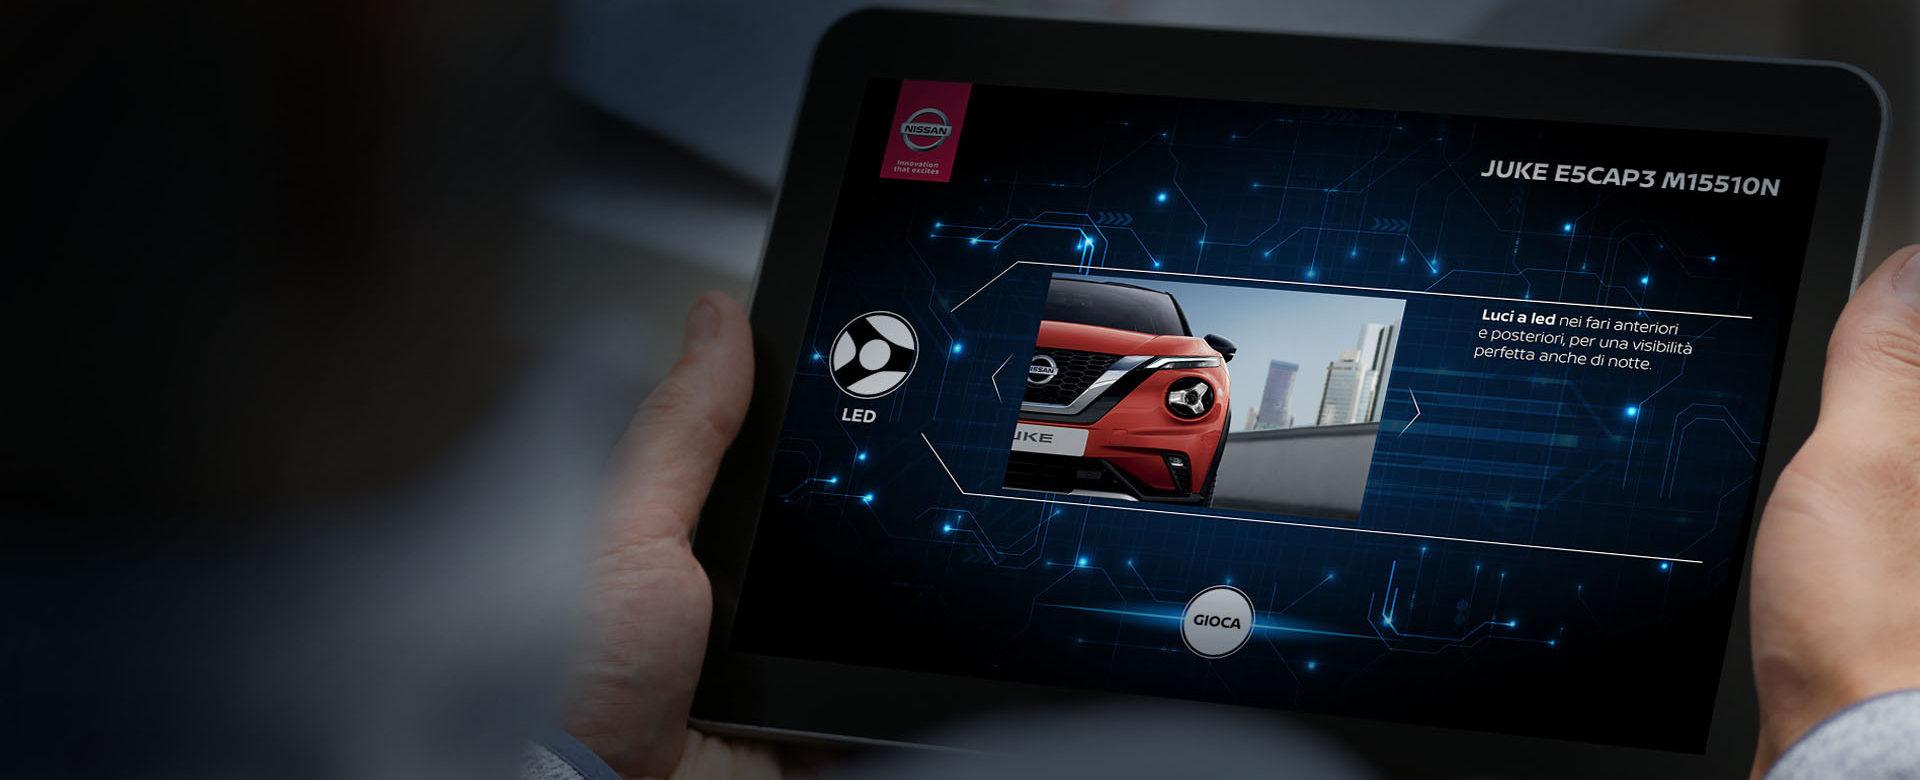 Nissan Juke - customer engagement advergame